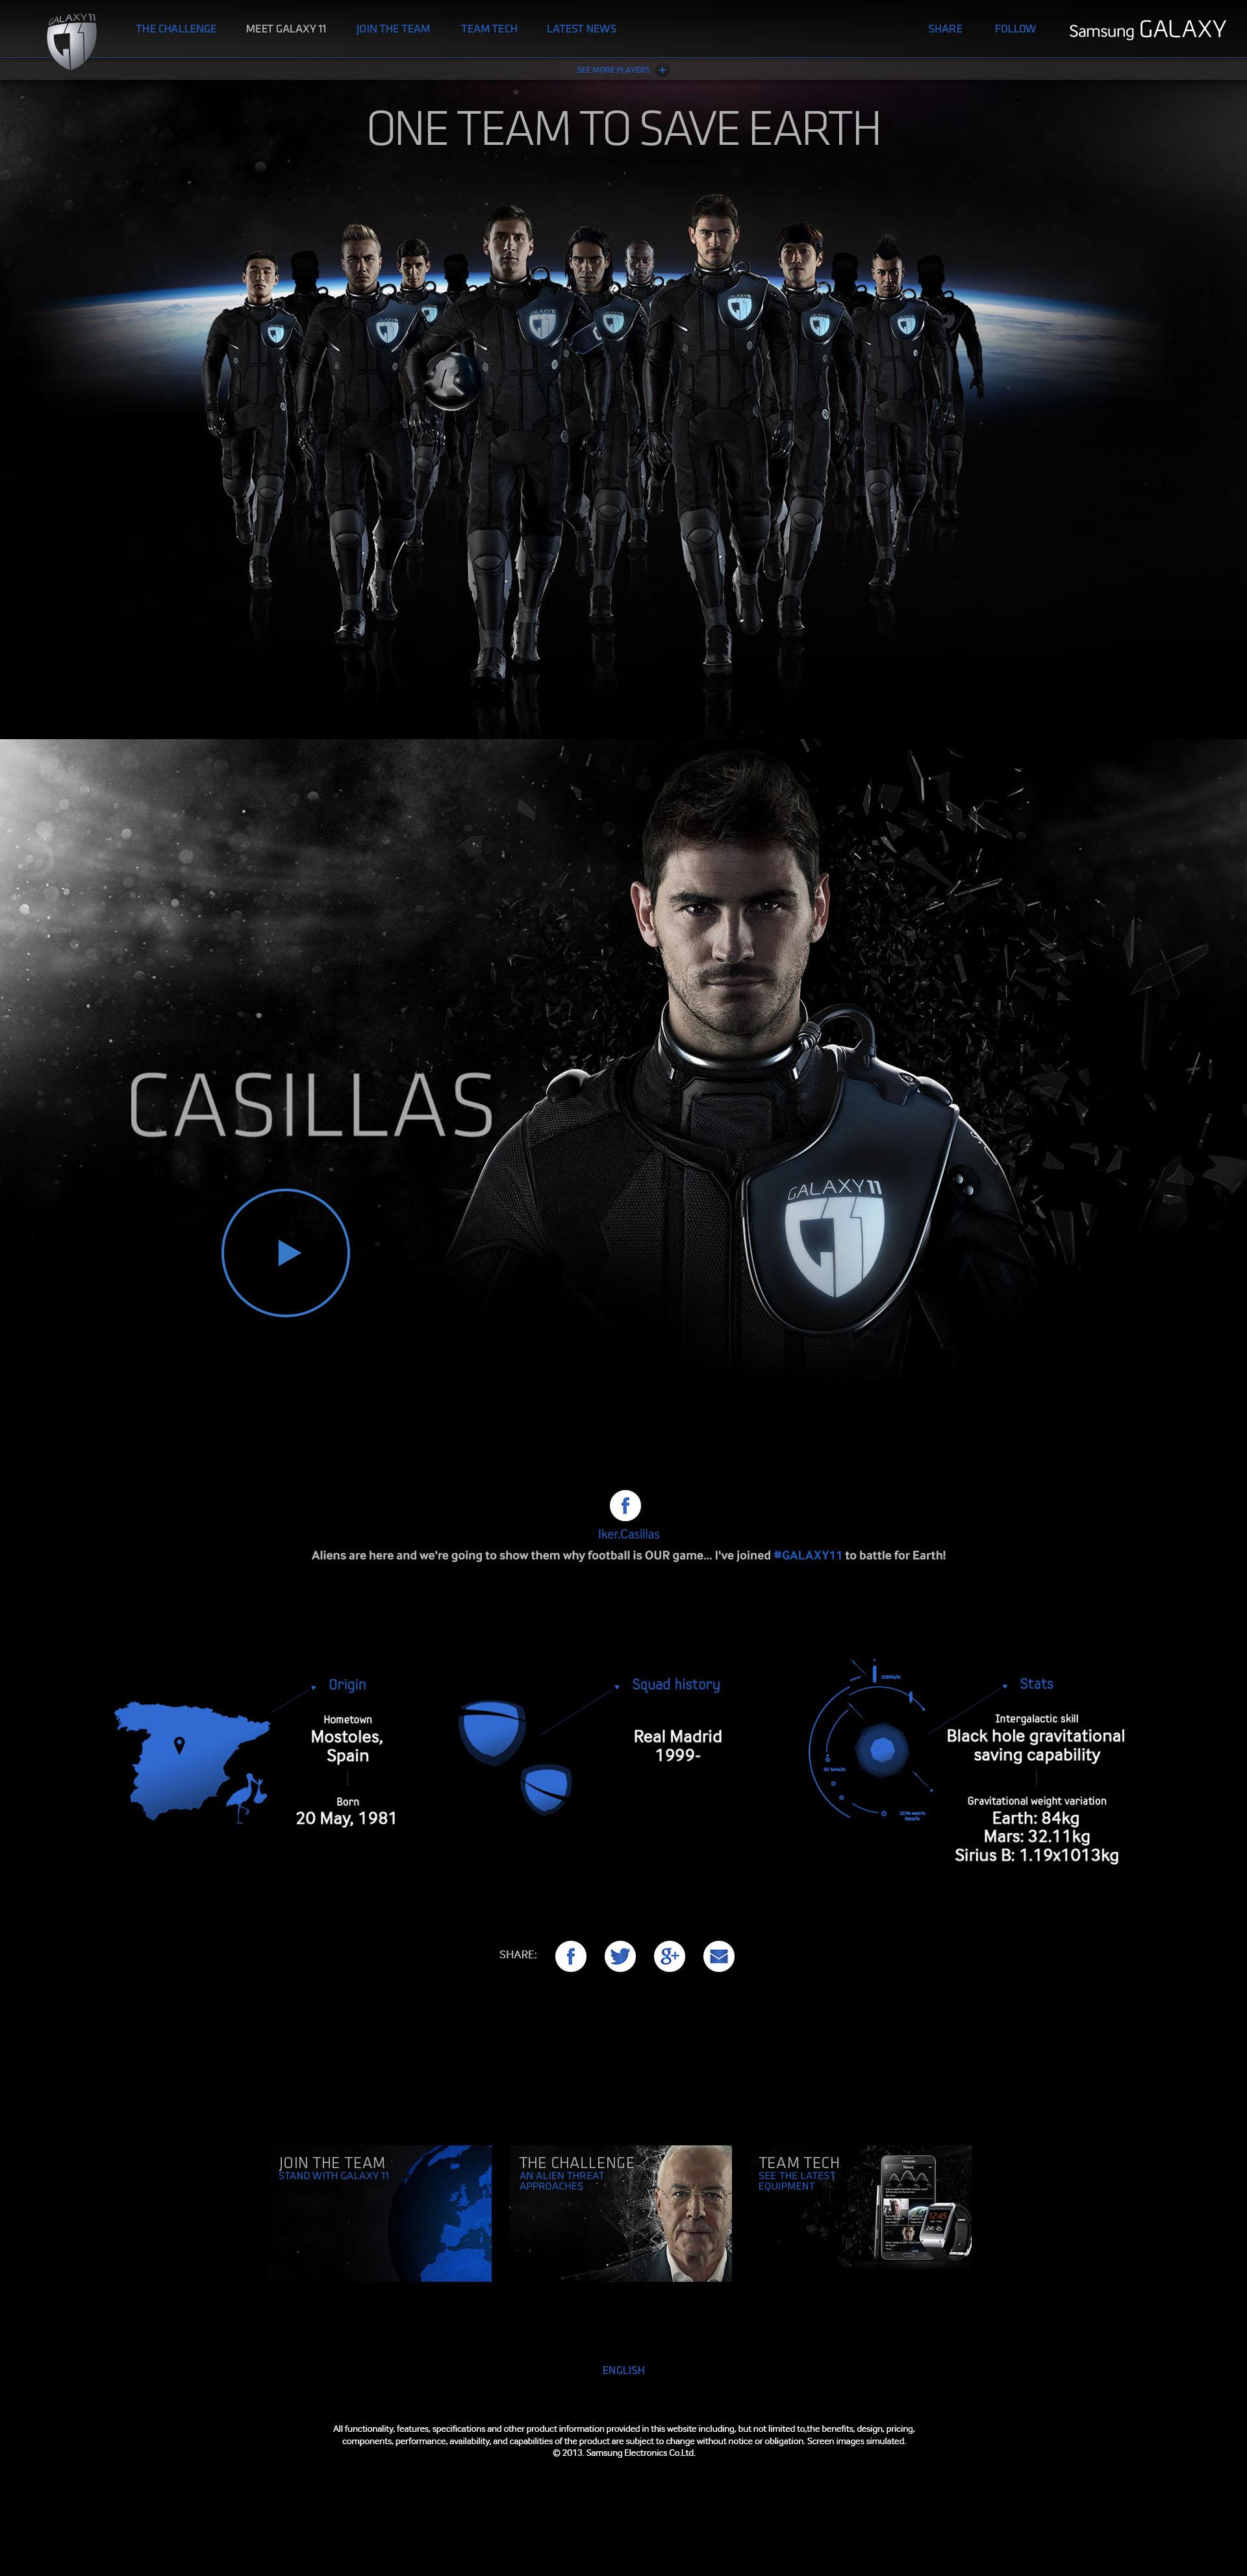 g11_0008_09-Casillas.jpg